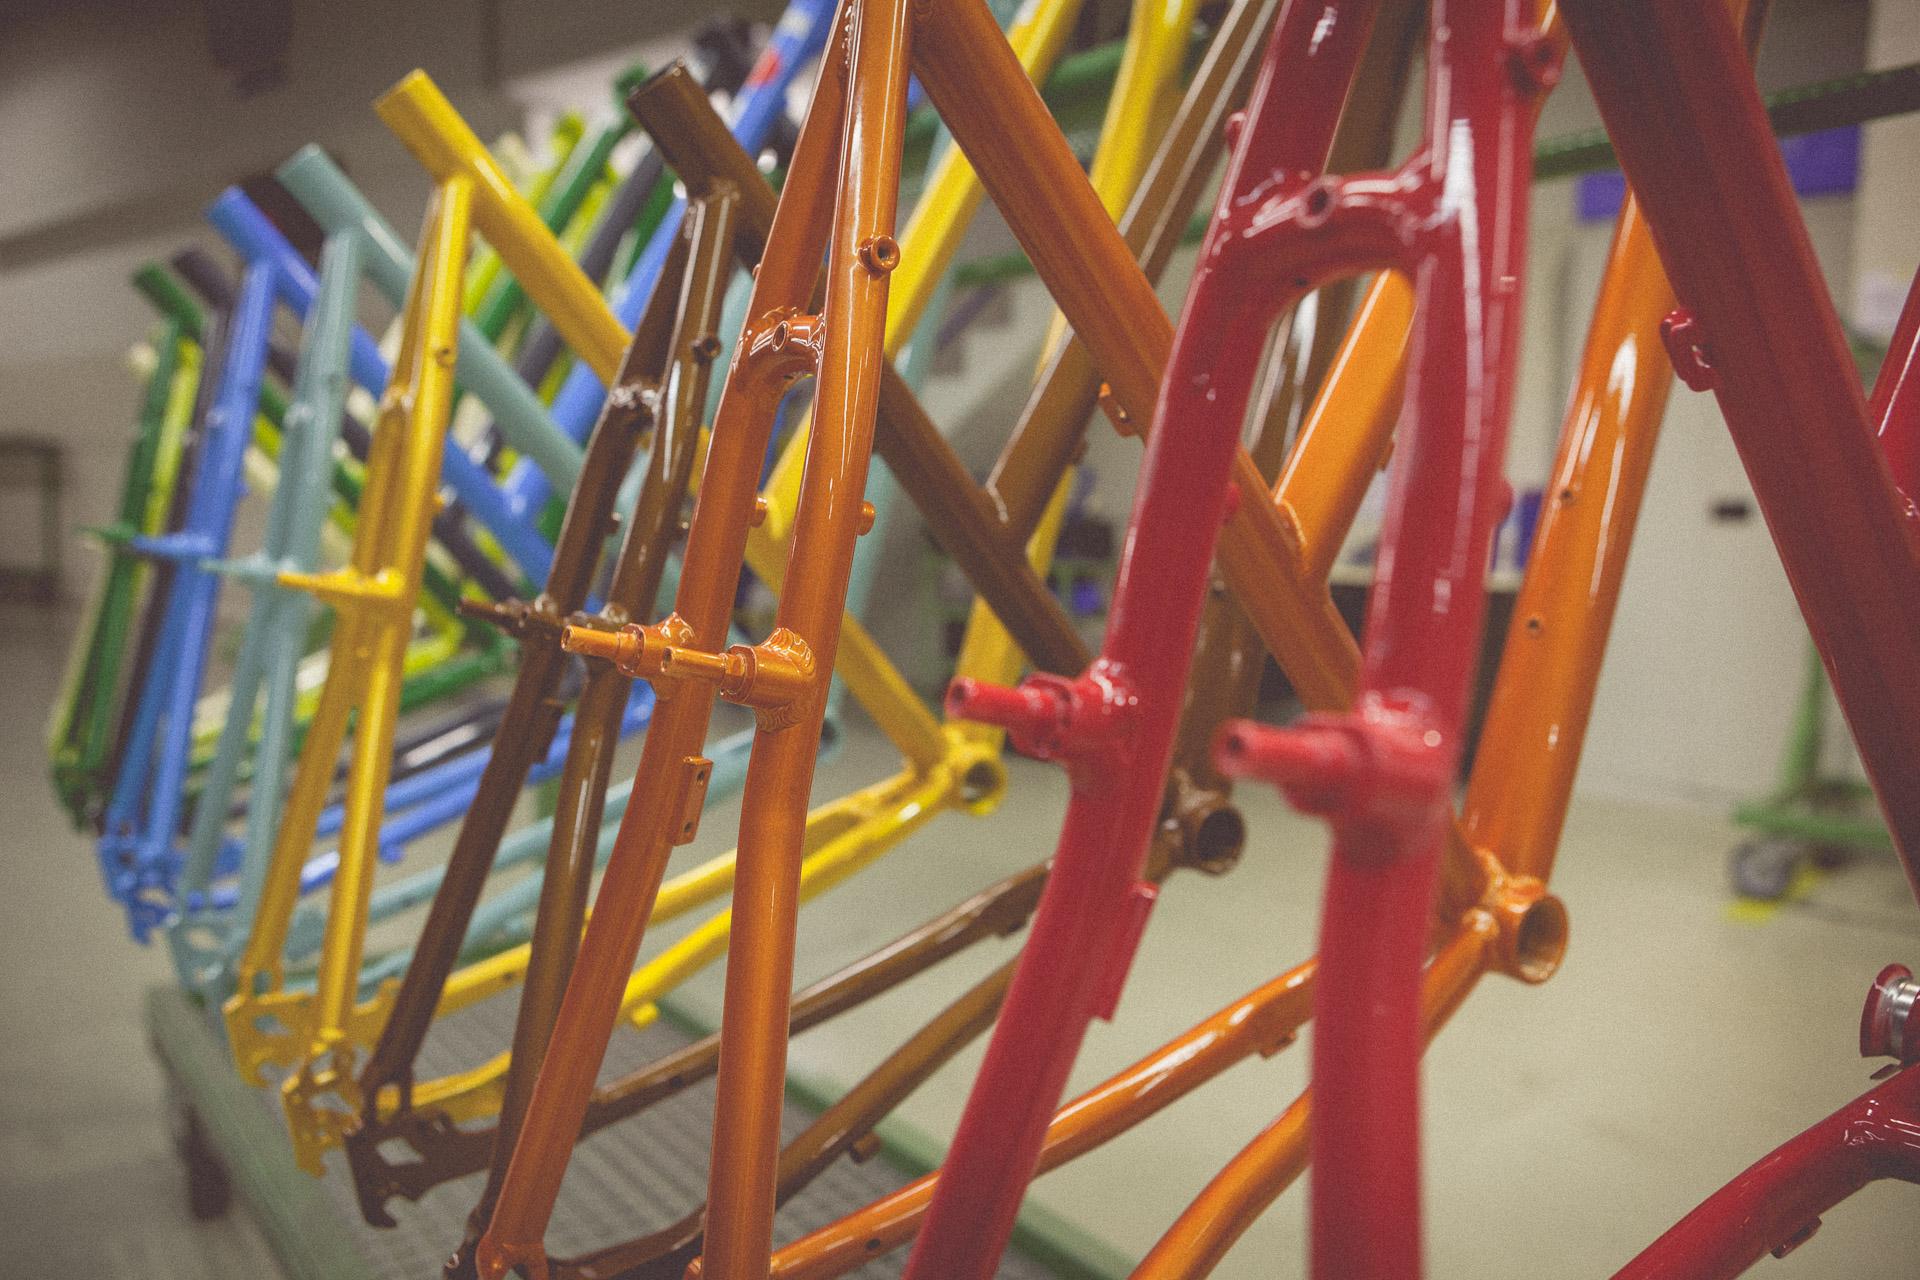 12-Derby-Cycle-Werke-Fahrradproduktion